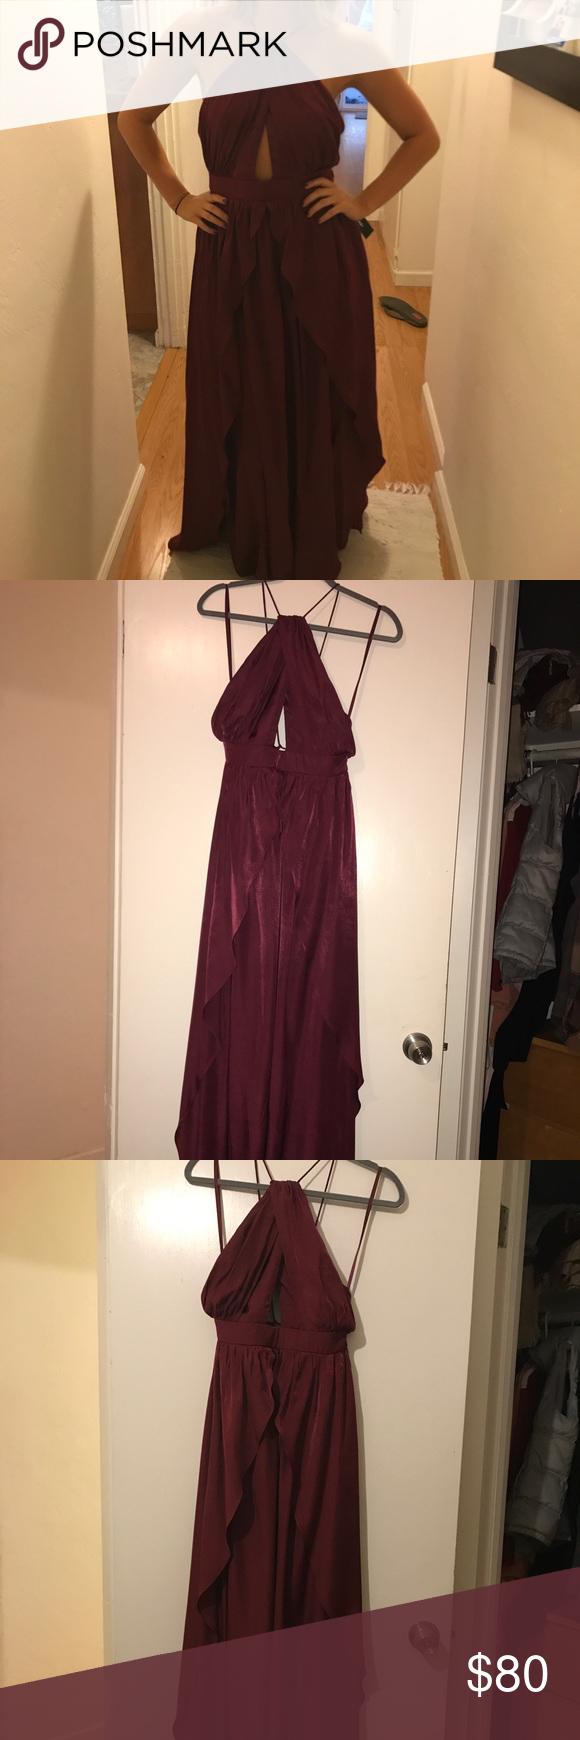 LULUS on my own burgundy maxi dress NWT  Pinterest  Burgundy maxi